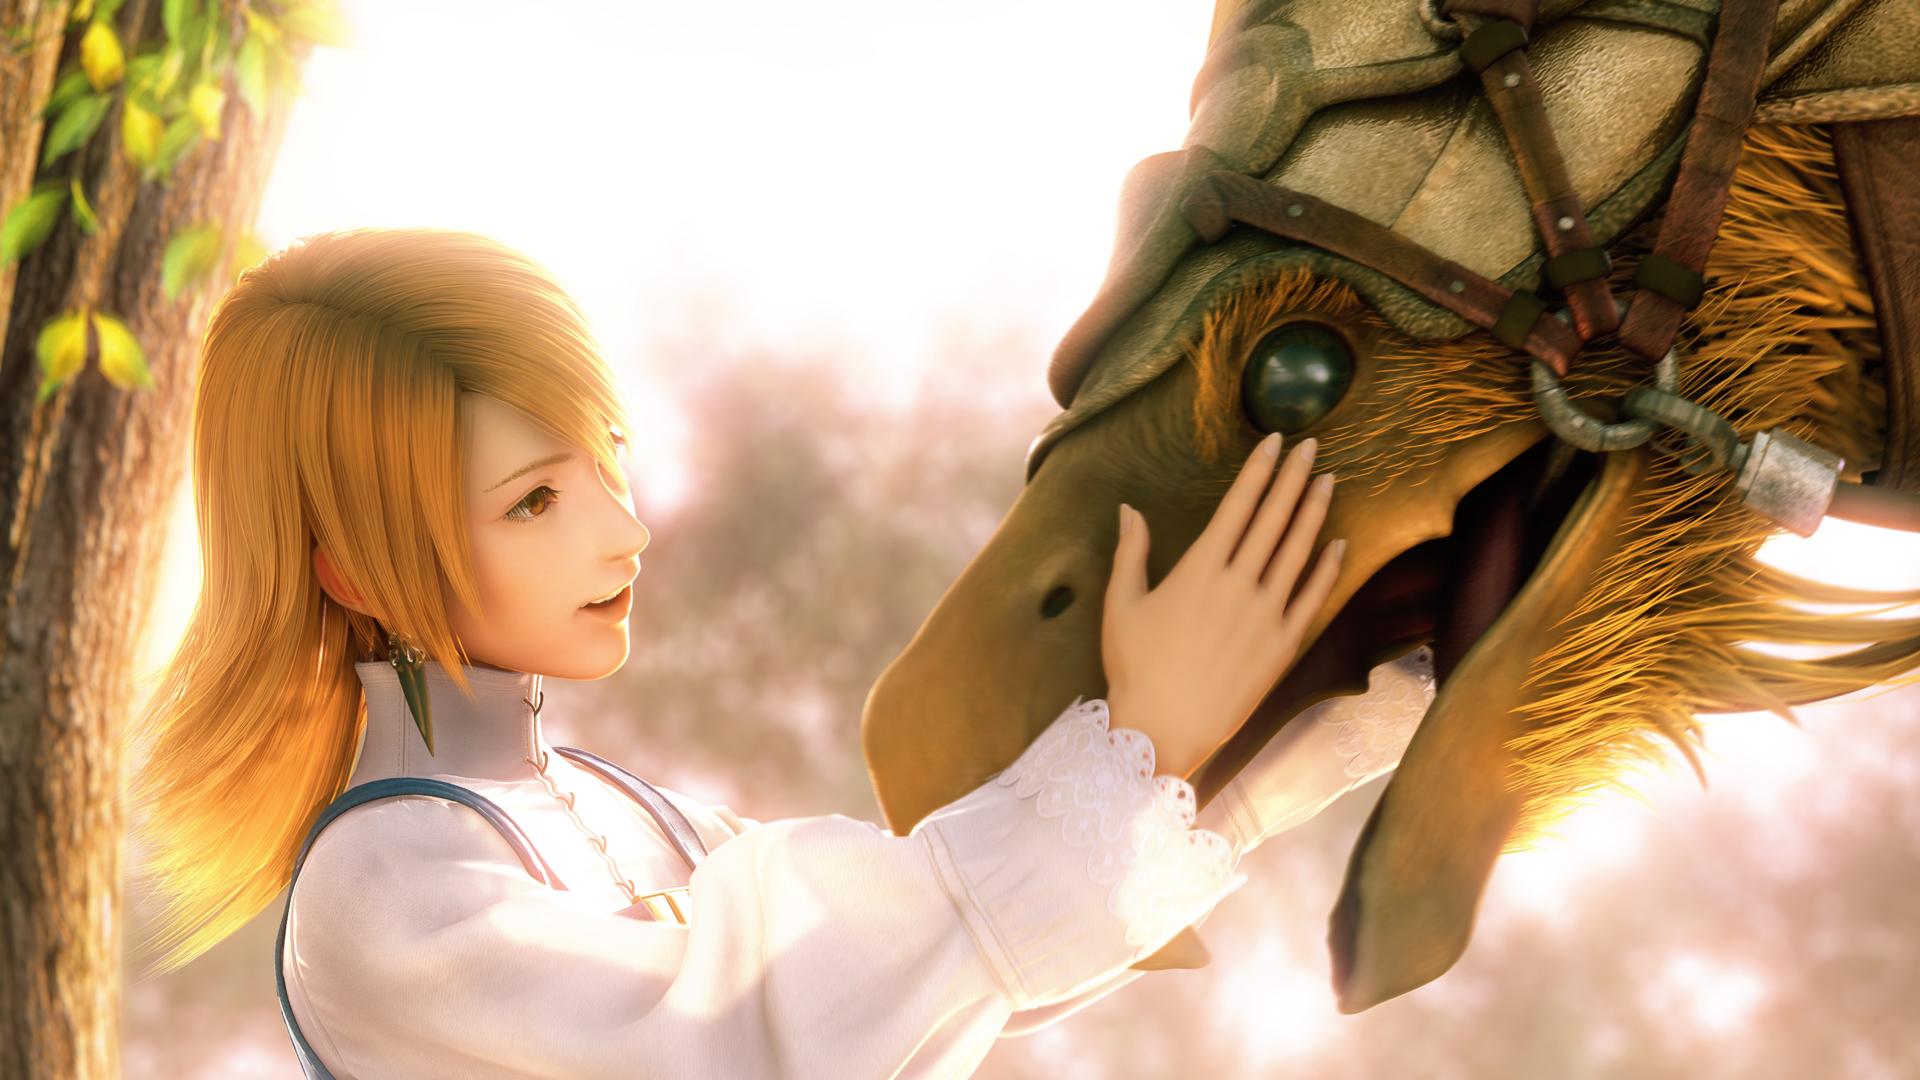 Final Fantasy III Wallpaper 009 – Affection